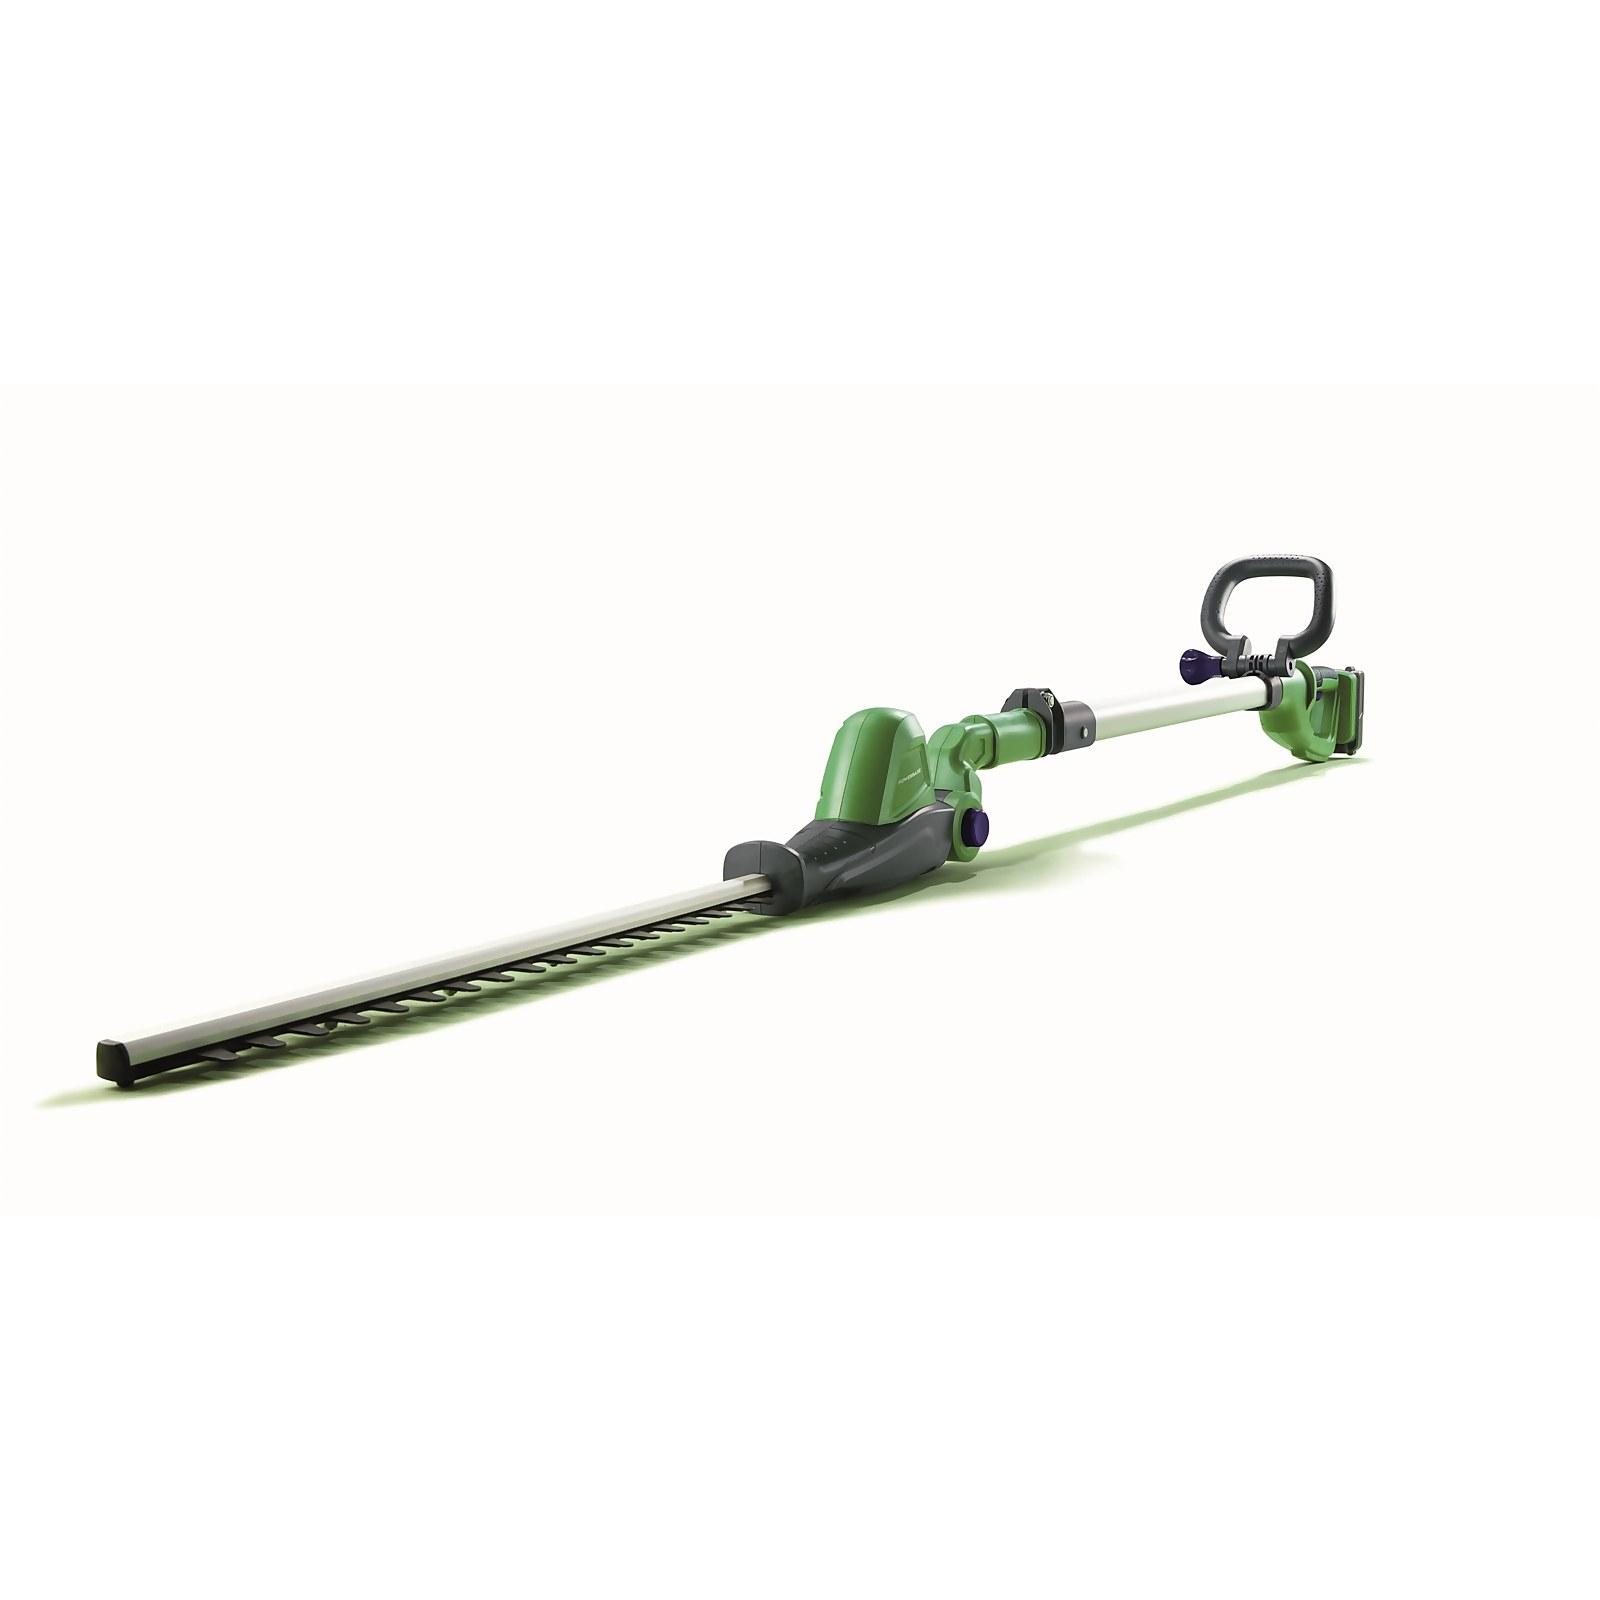 Powerbase 20V Cordless Pole Hedge Trimmer 41cm